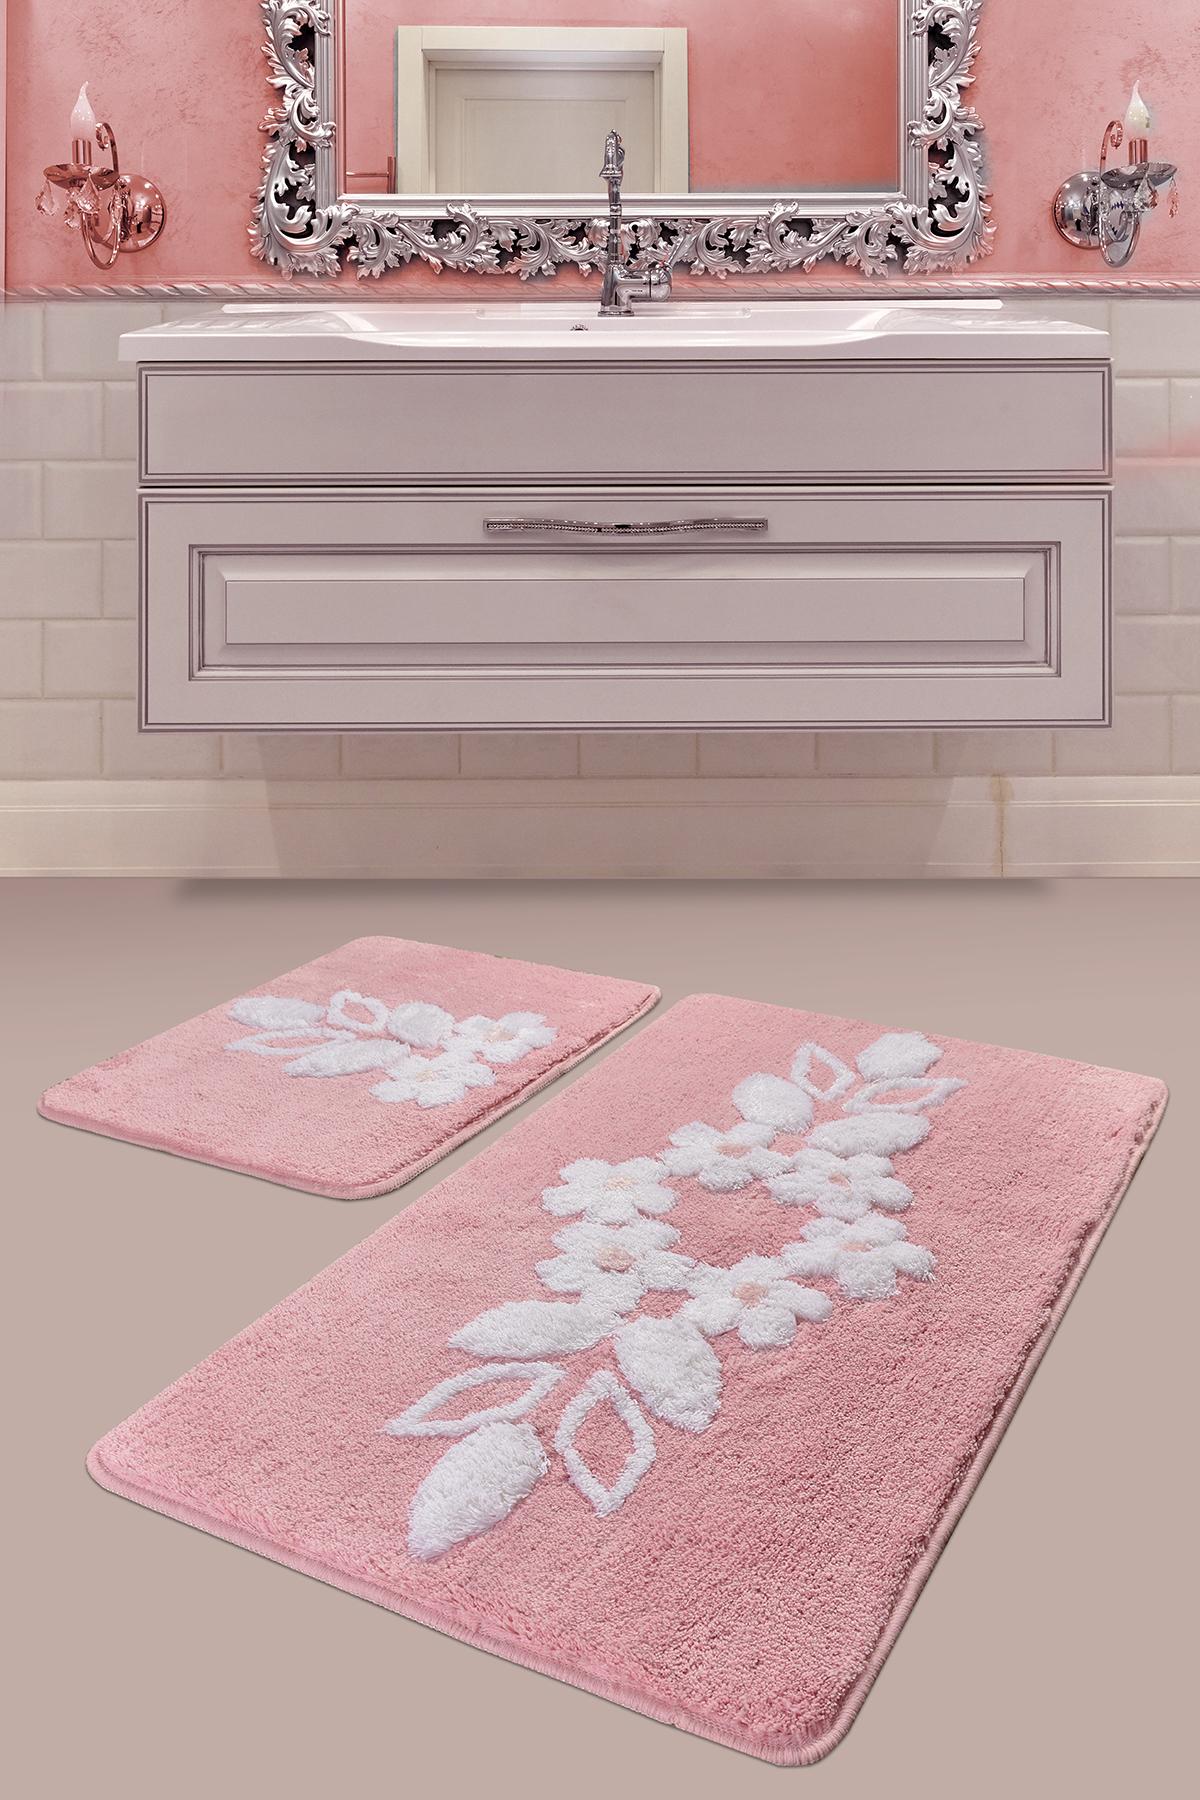 Коврик для ванной DO&CO (60Х100 см/50x60 см) BELLA